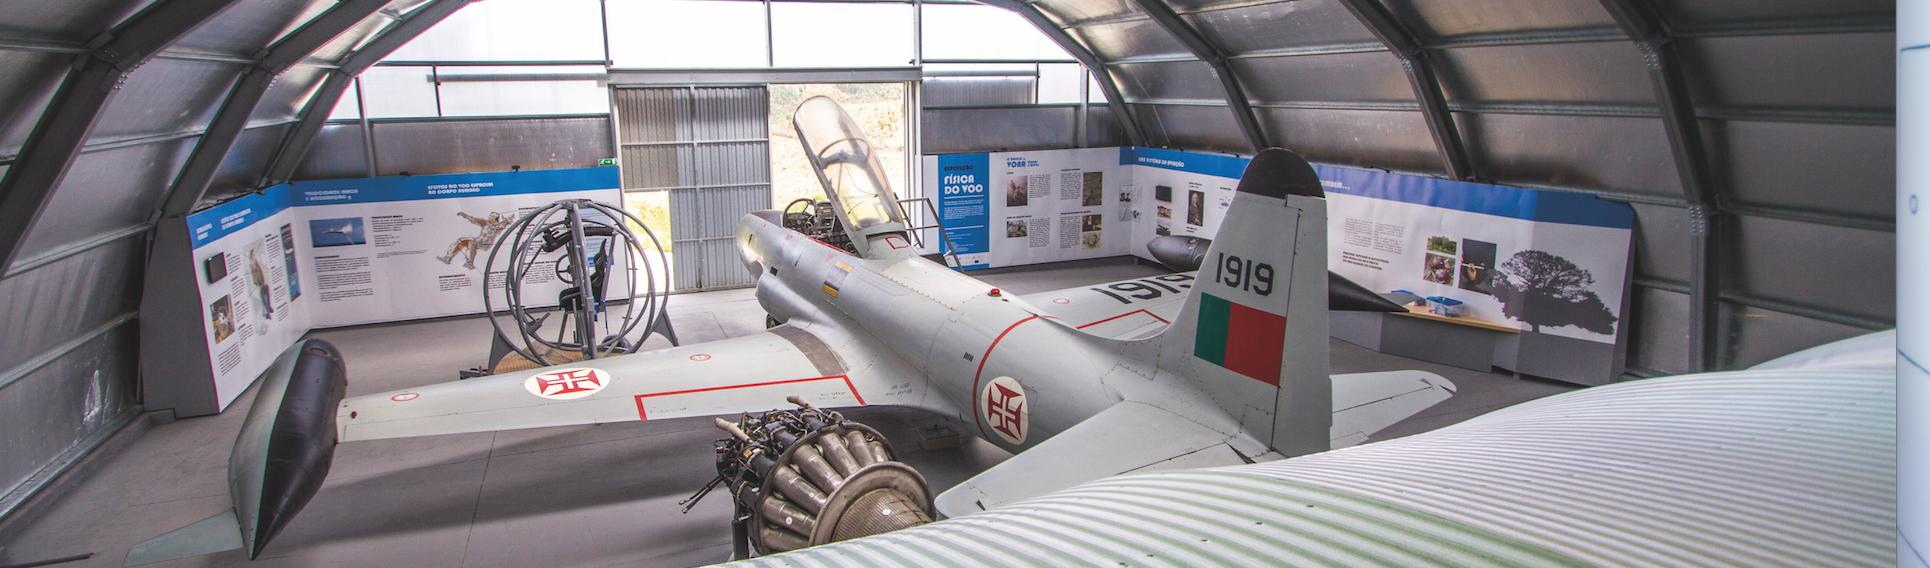 Física do Voo - Avião a Jato T33